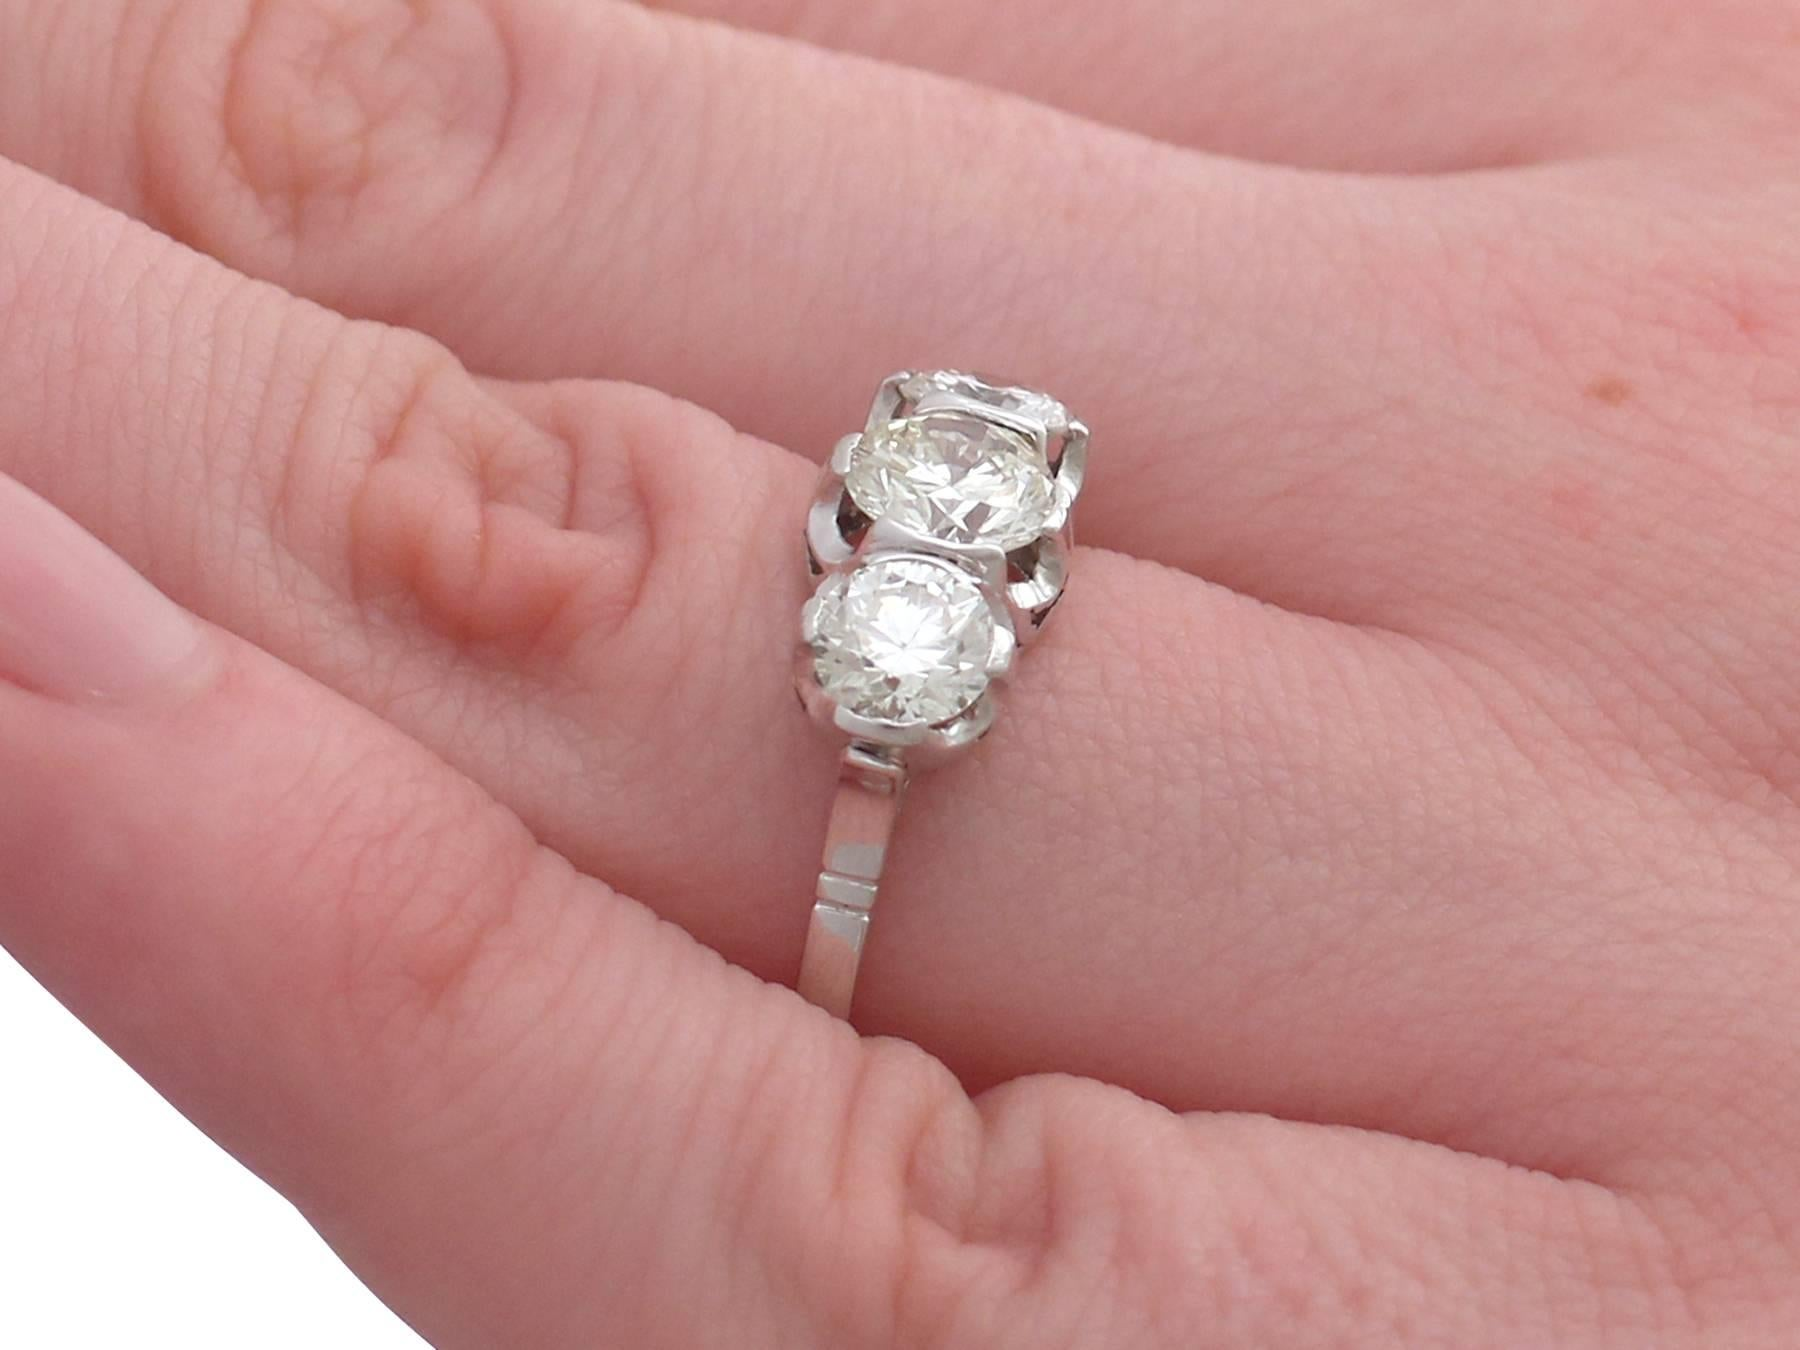 Vintage 2.17 Carat Diamond and Platinum Trilogy Ring For Sale at 1stdibs